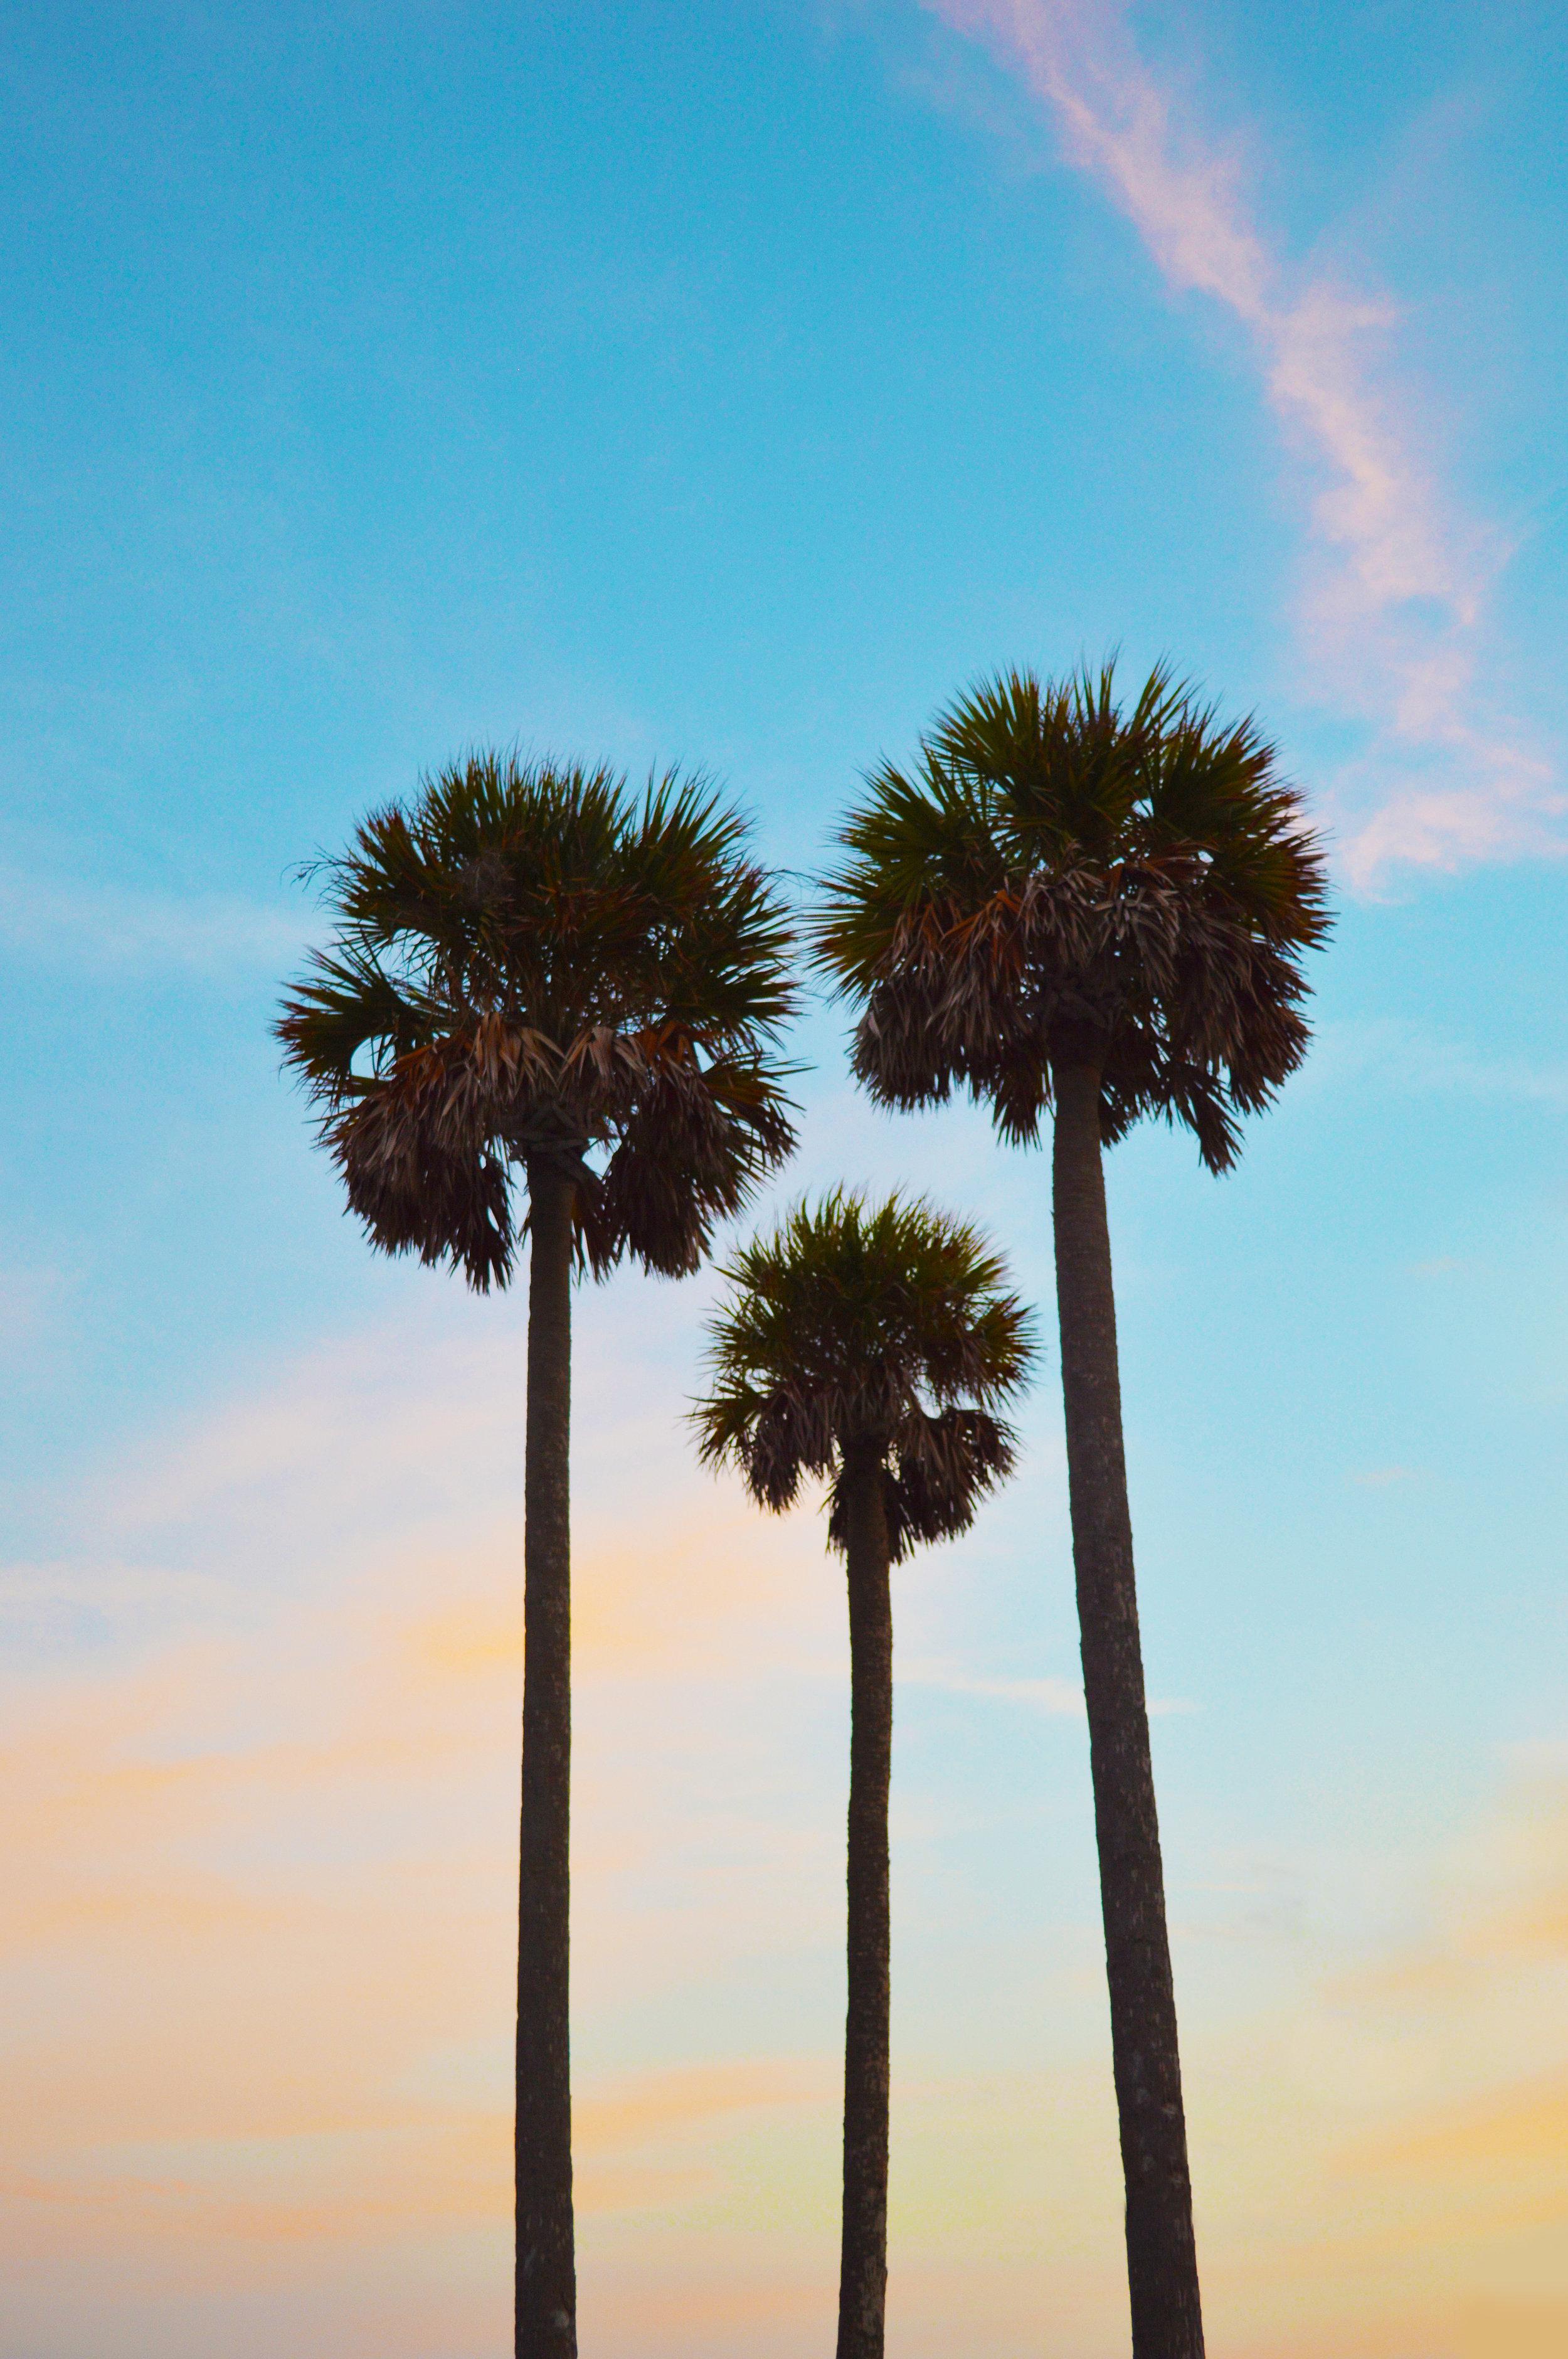 Lido Key Sarasota Florida Palm Trees photo by Kristen Laczi